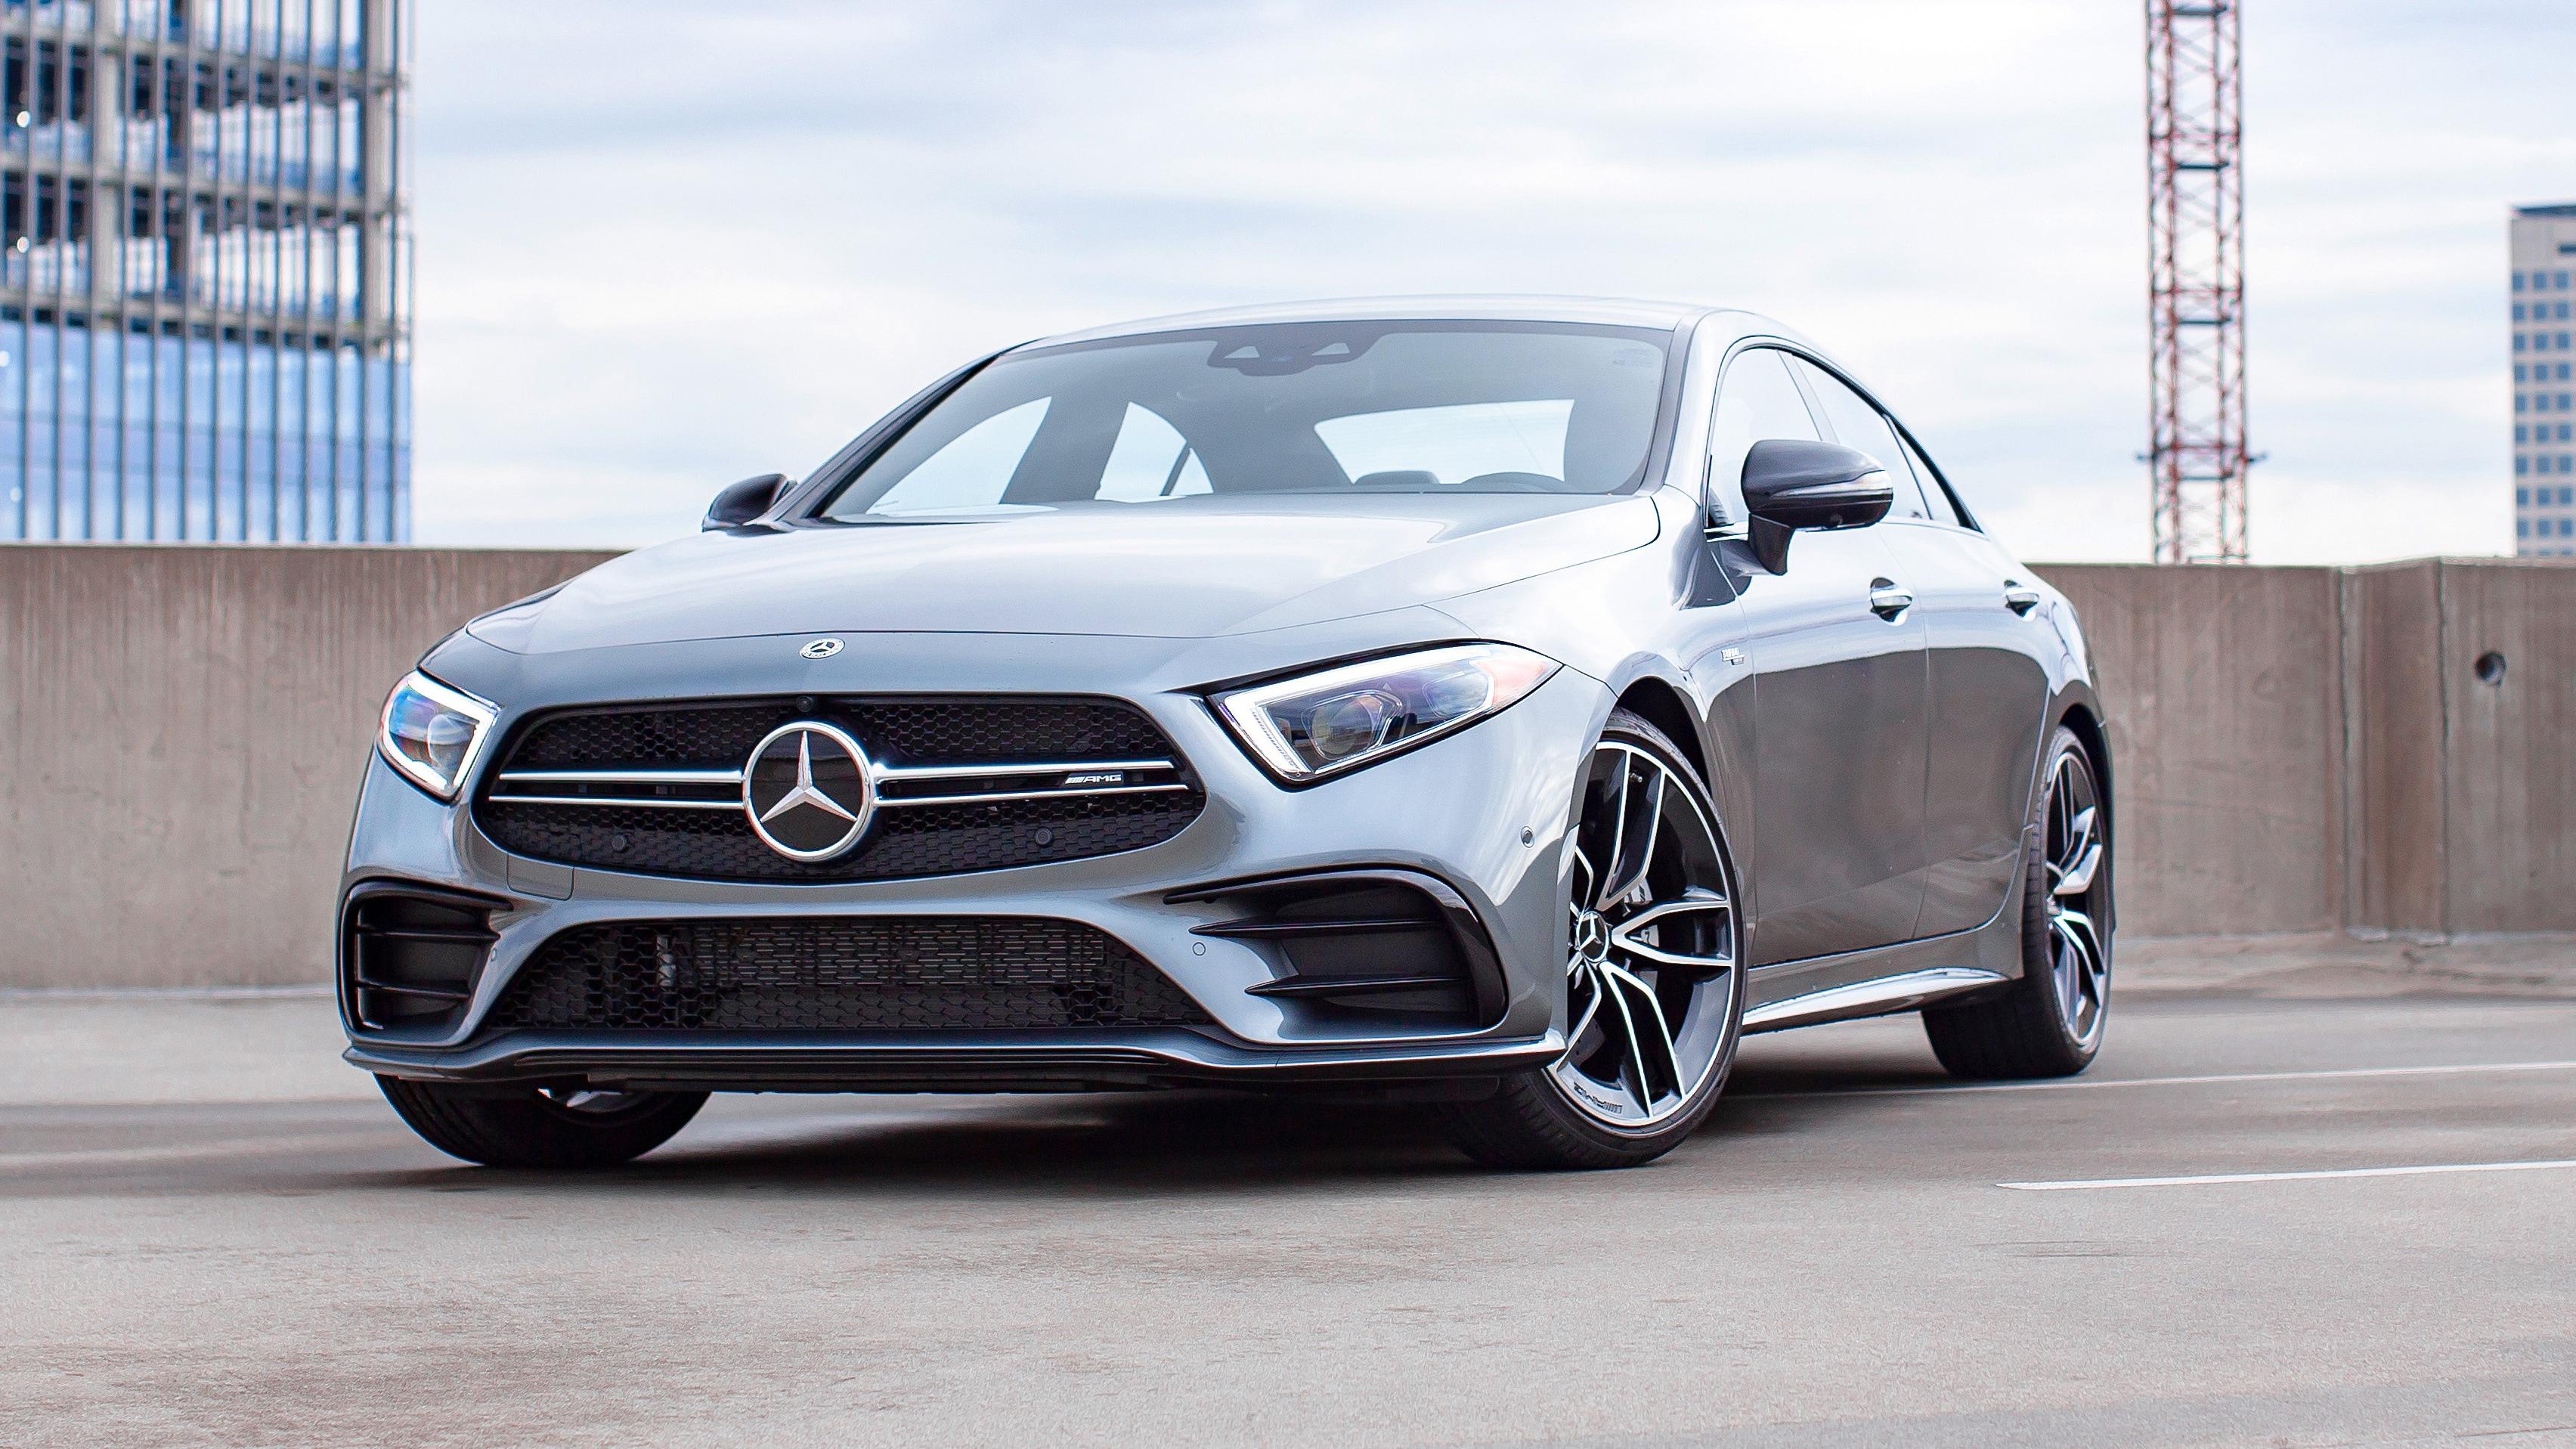 Mercedes Benz Of Ann Arbor >> Shop By Mercedes-Benz Model | Mercedes-Benz of Ann Arbor